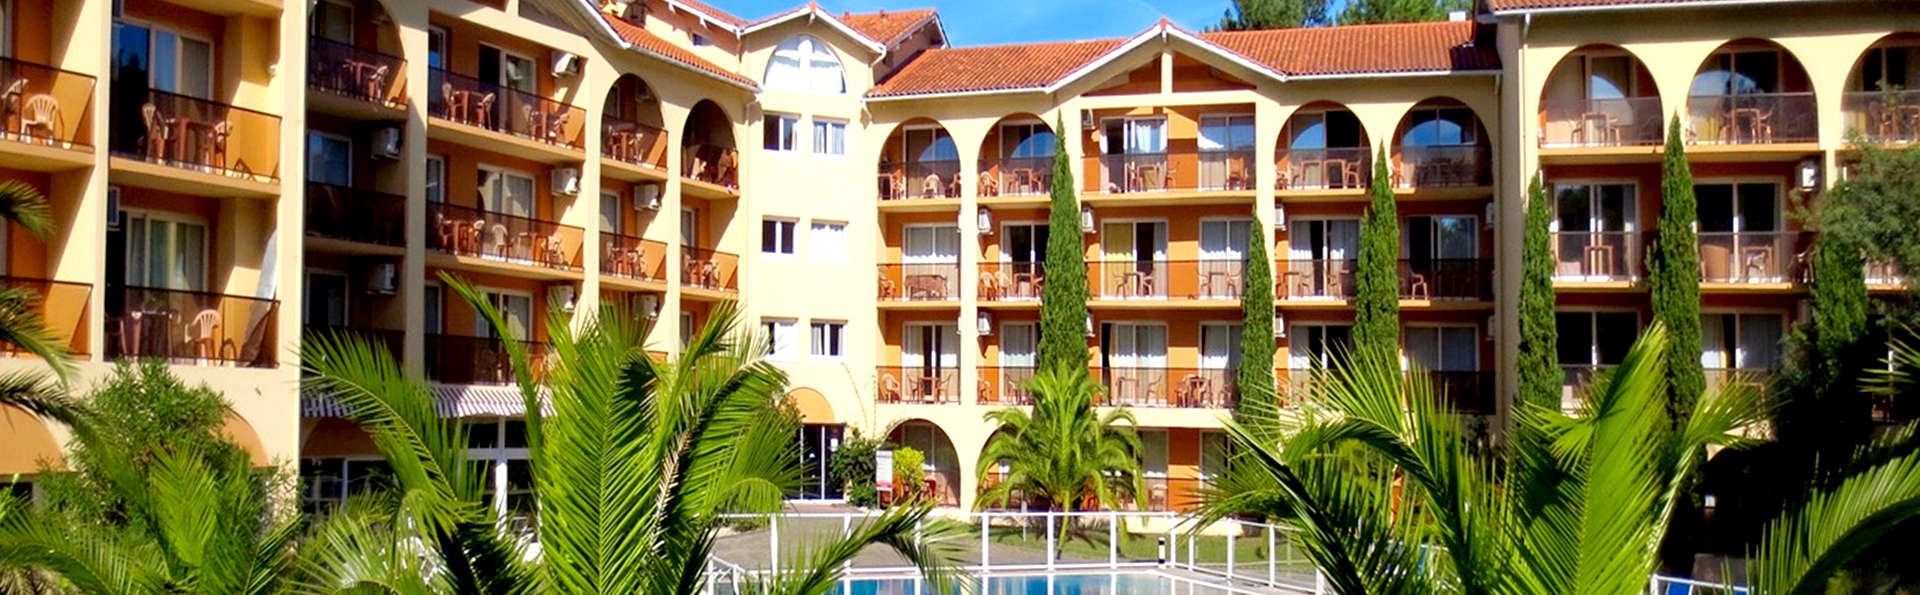 Escapada relax en apartamento cerca de Biarritz